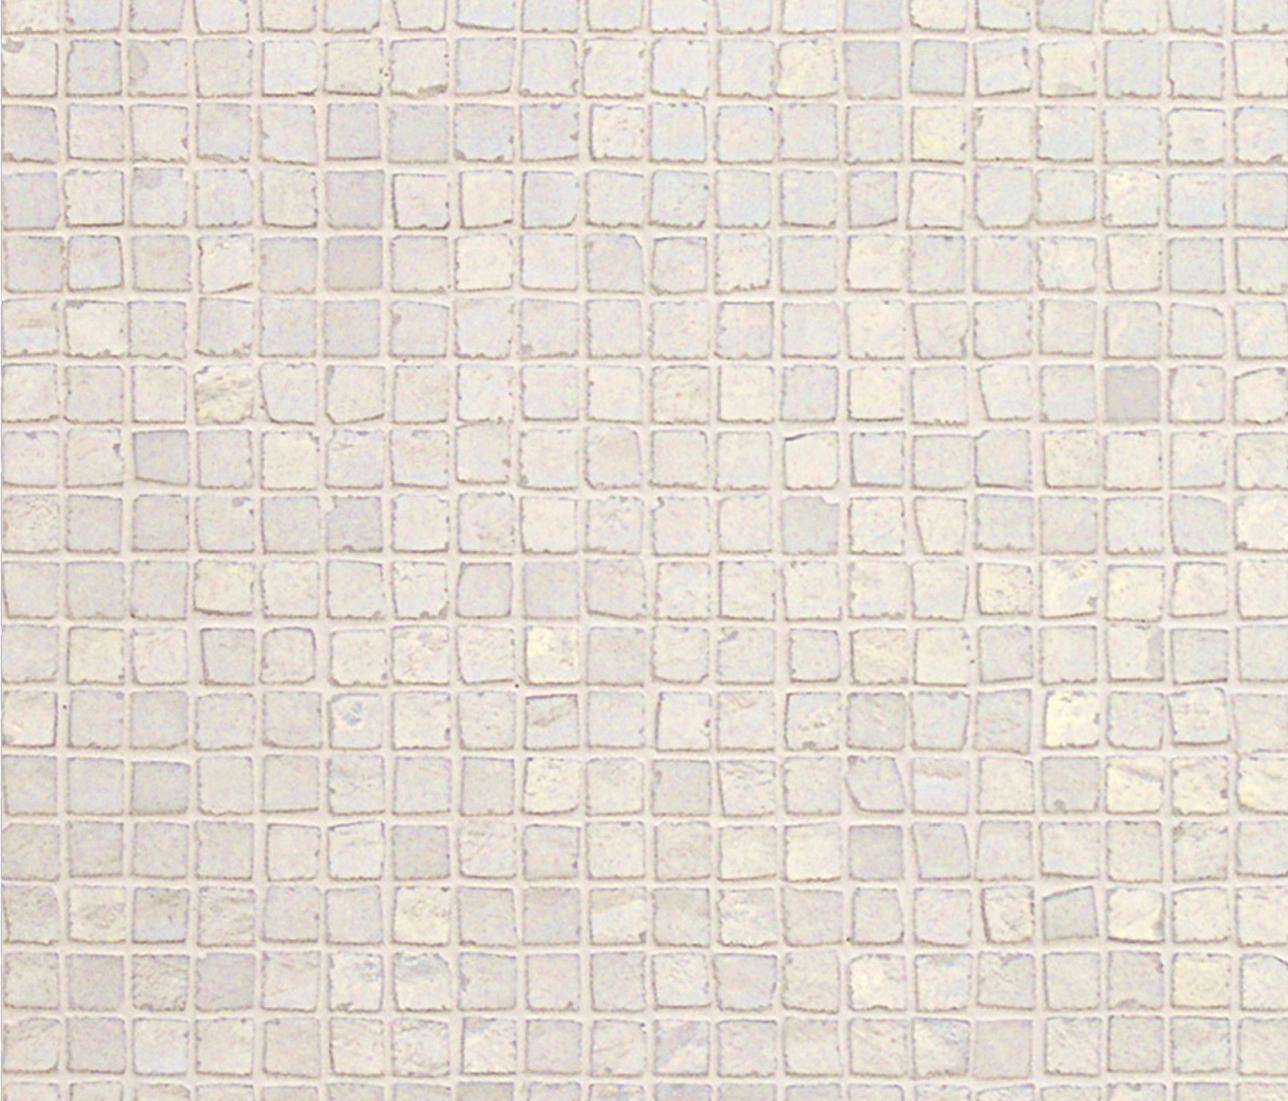 Vetro neutra bianco lux glass mosaics from casa dolce for Vetro casa dolce casa